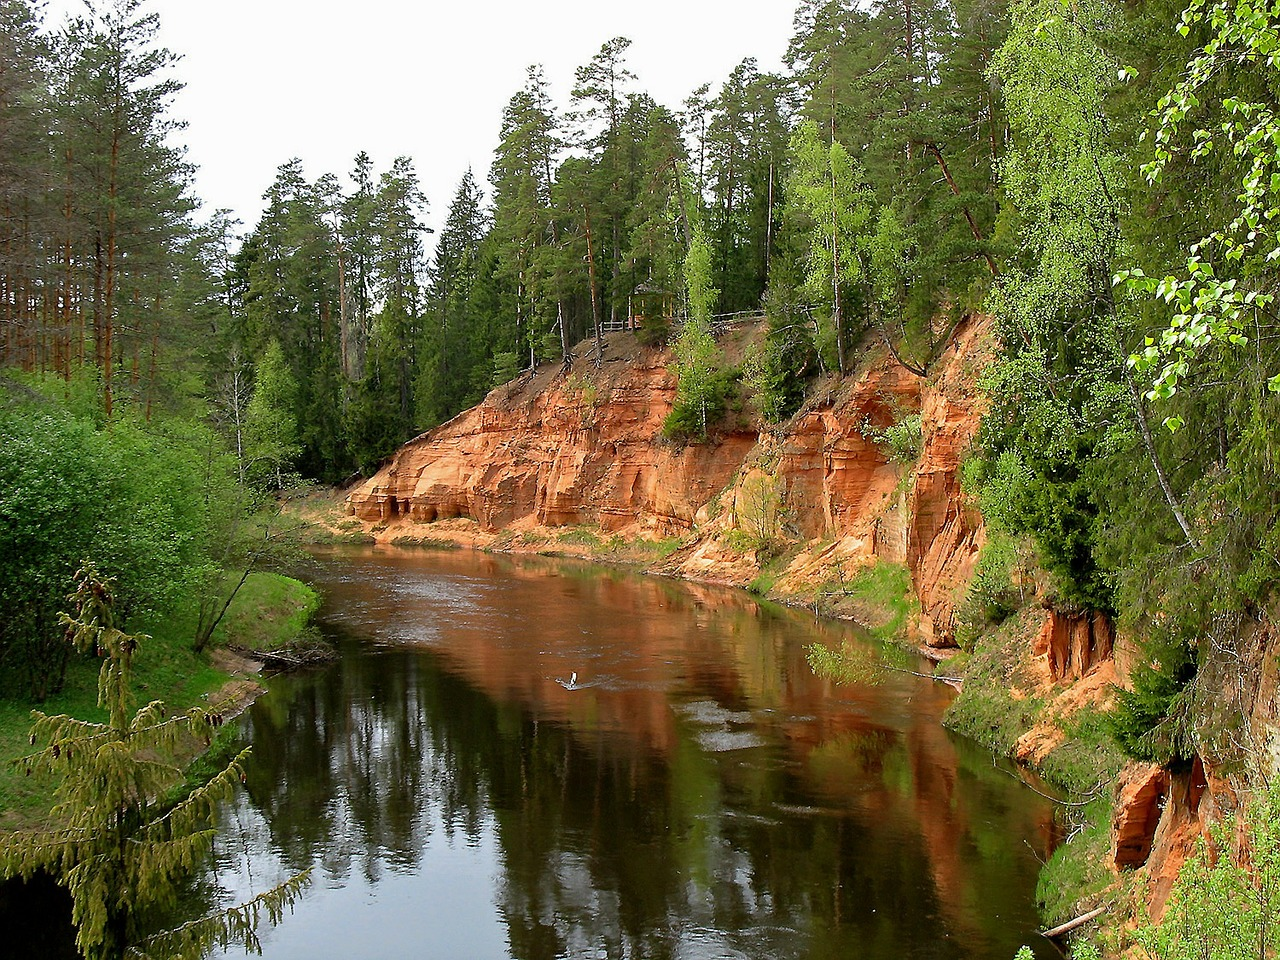 latvian autumn forest river - photo #26